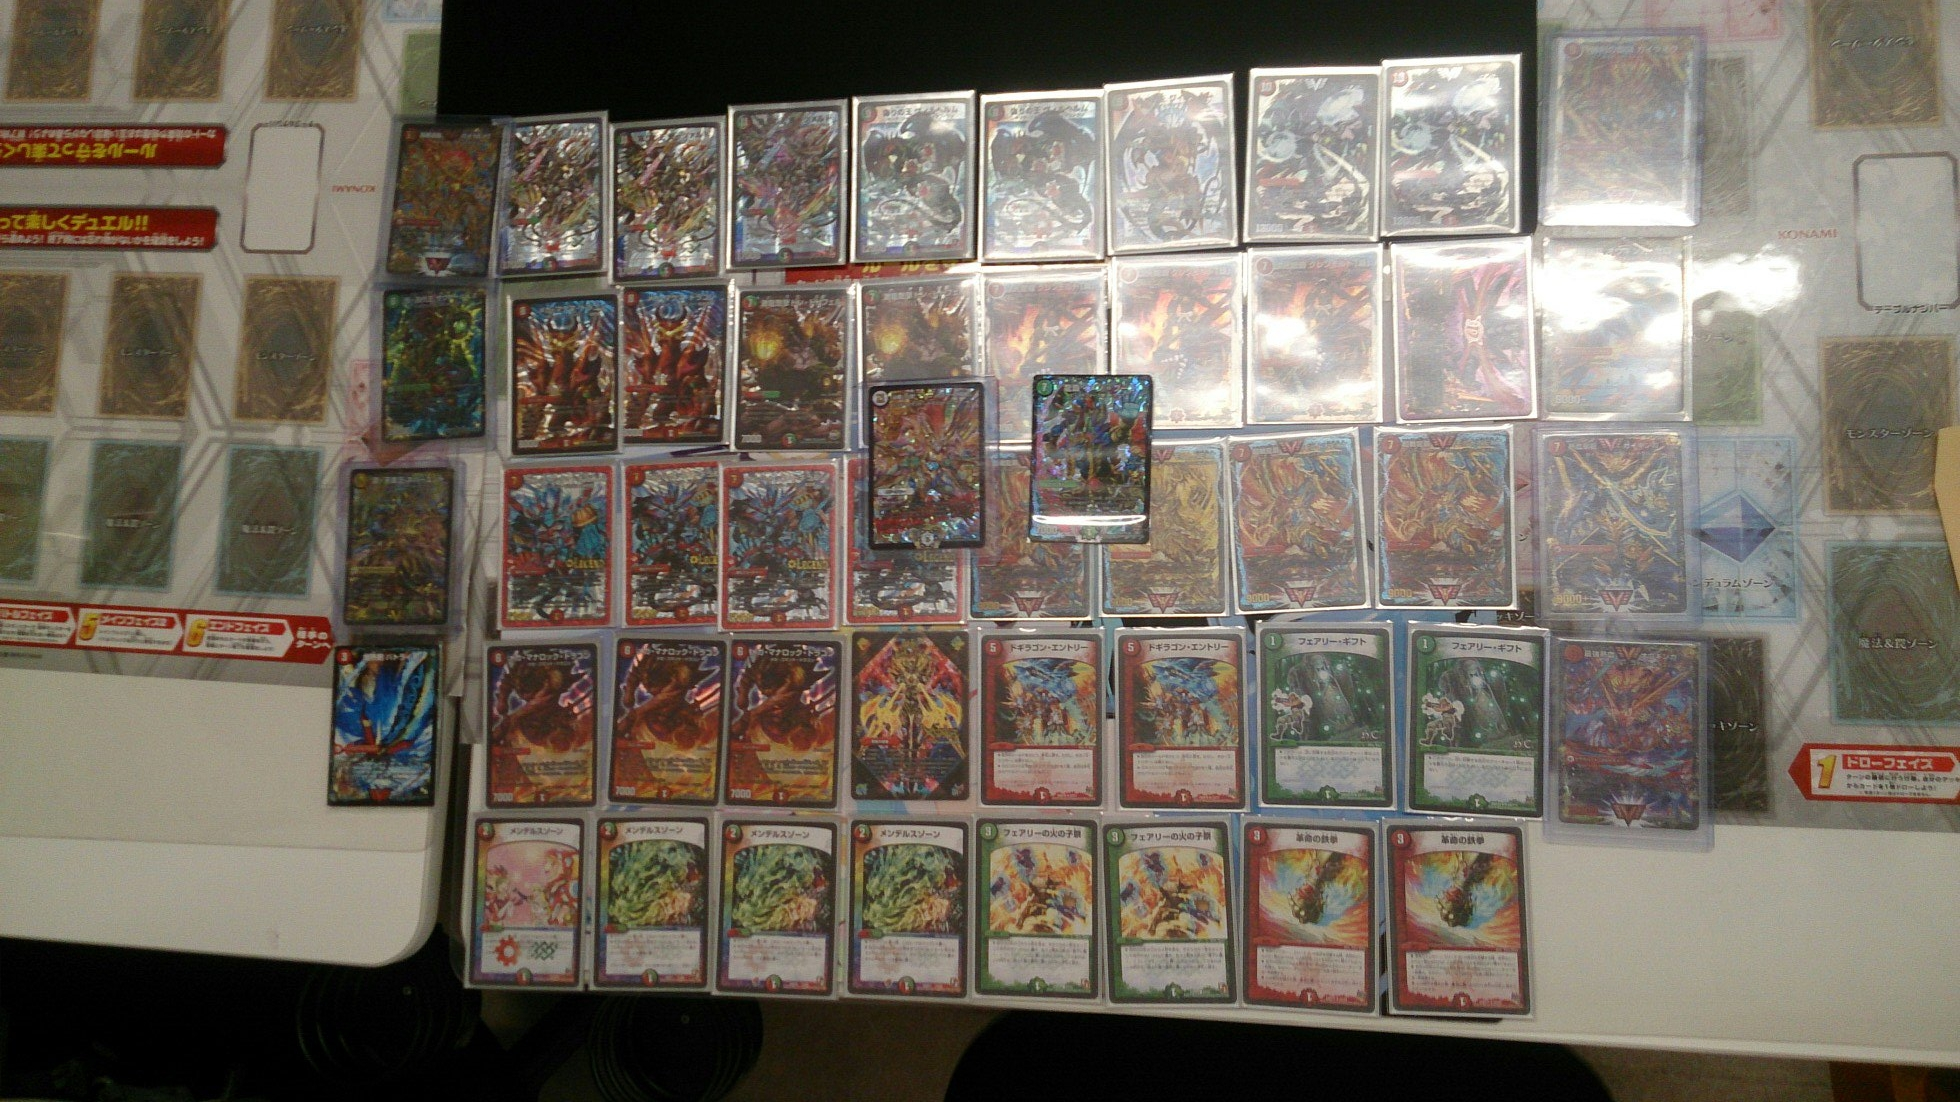 dm-takatsuki-cs-6th-deck-1st.jpg